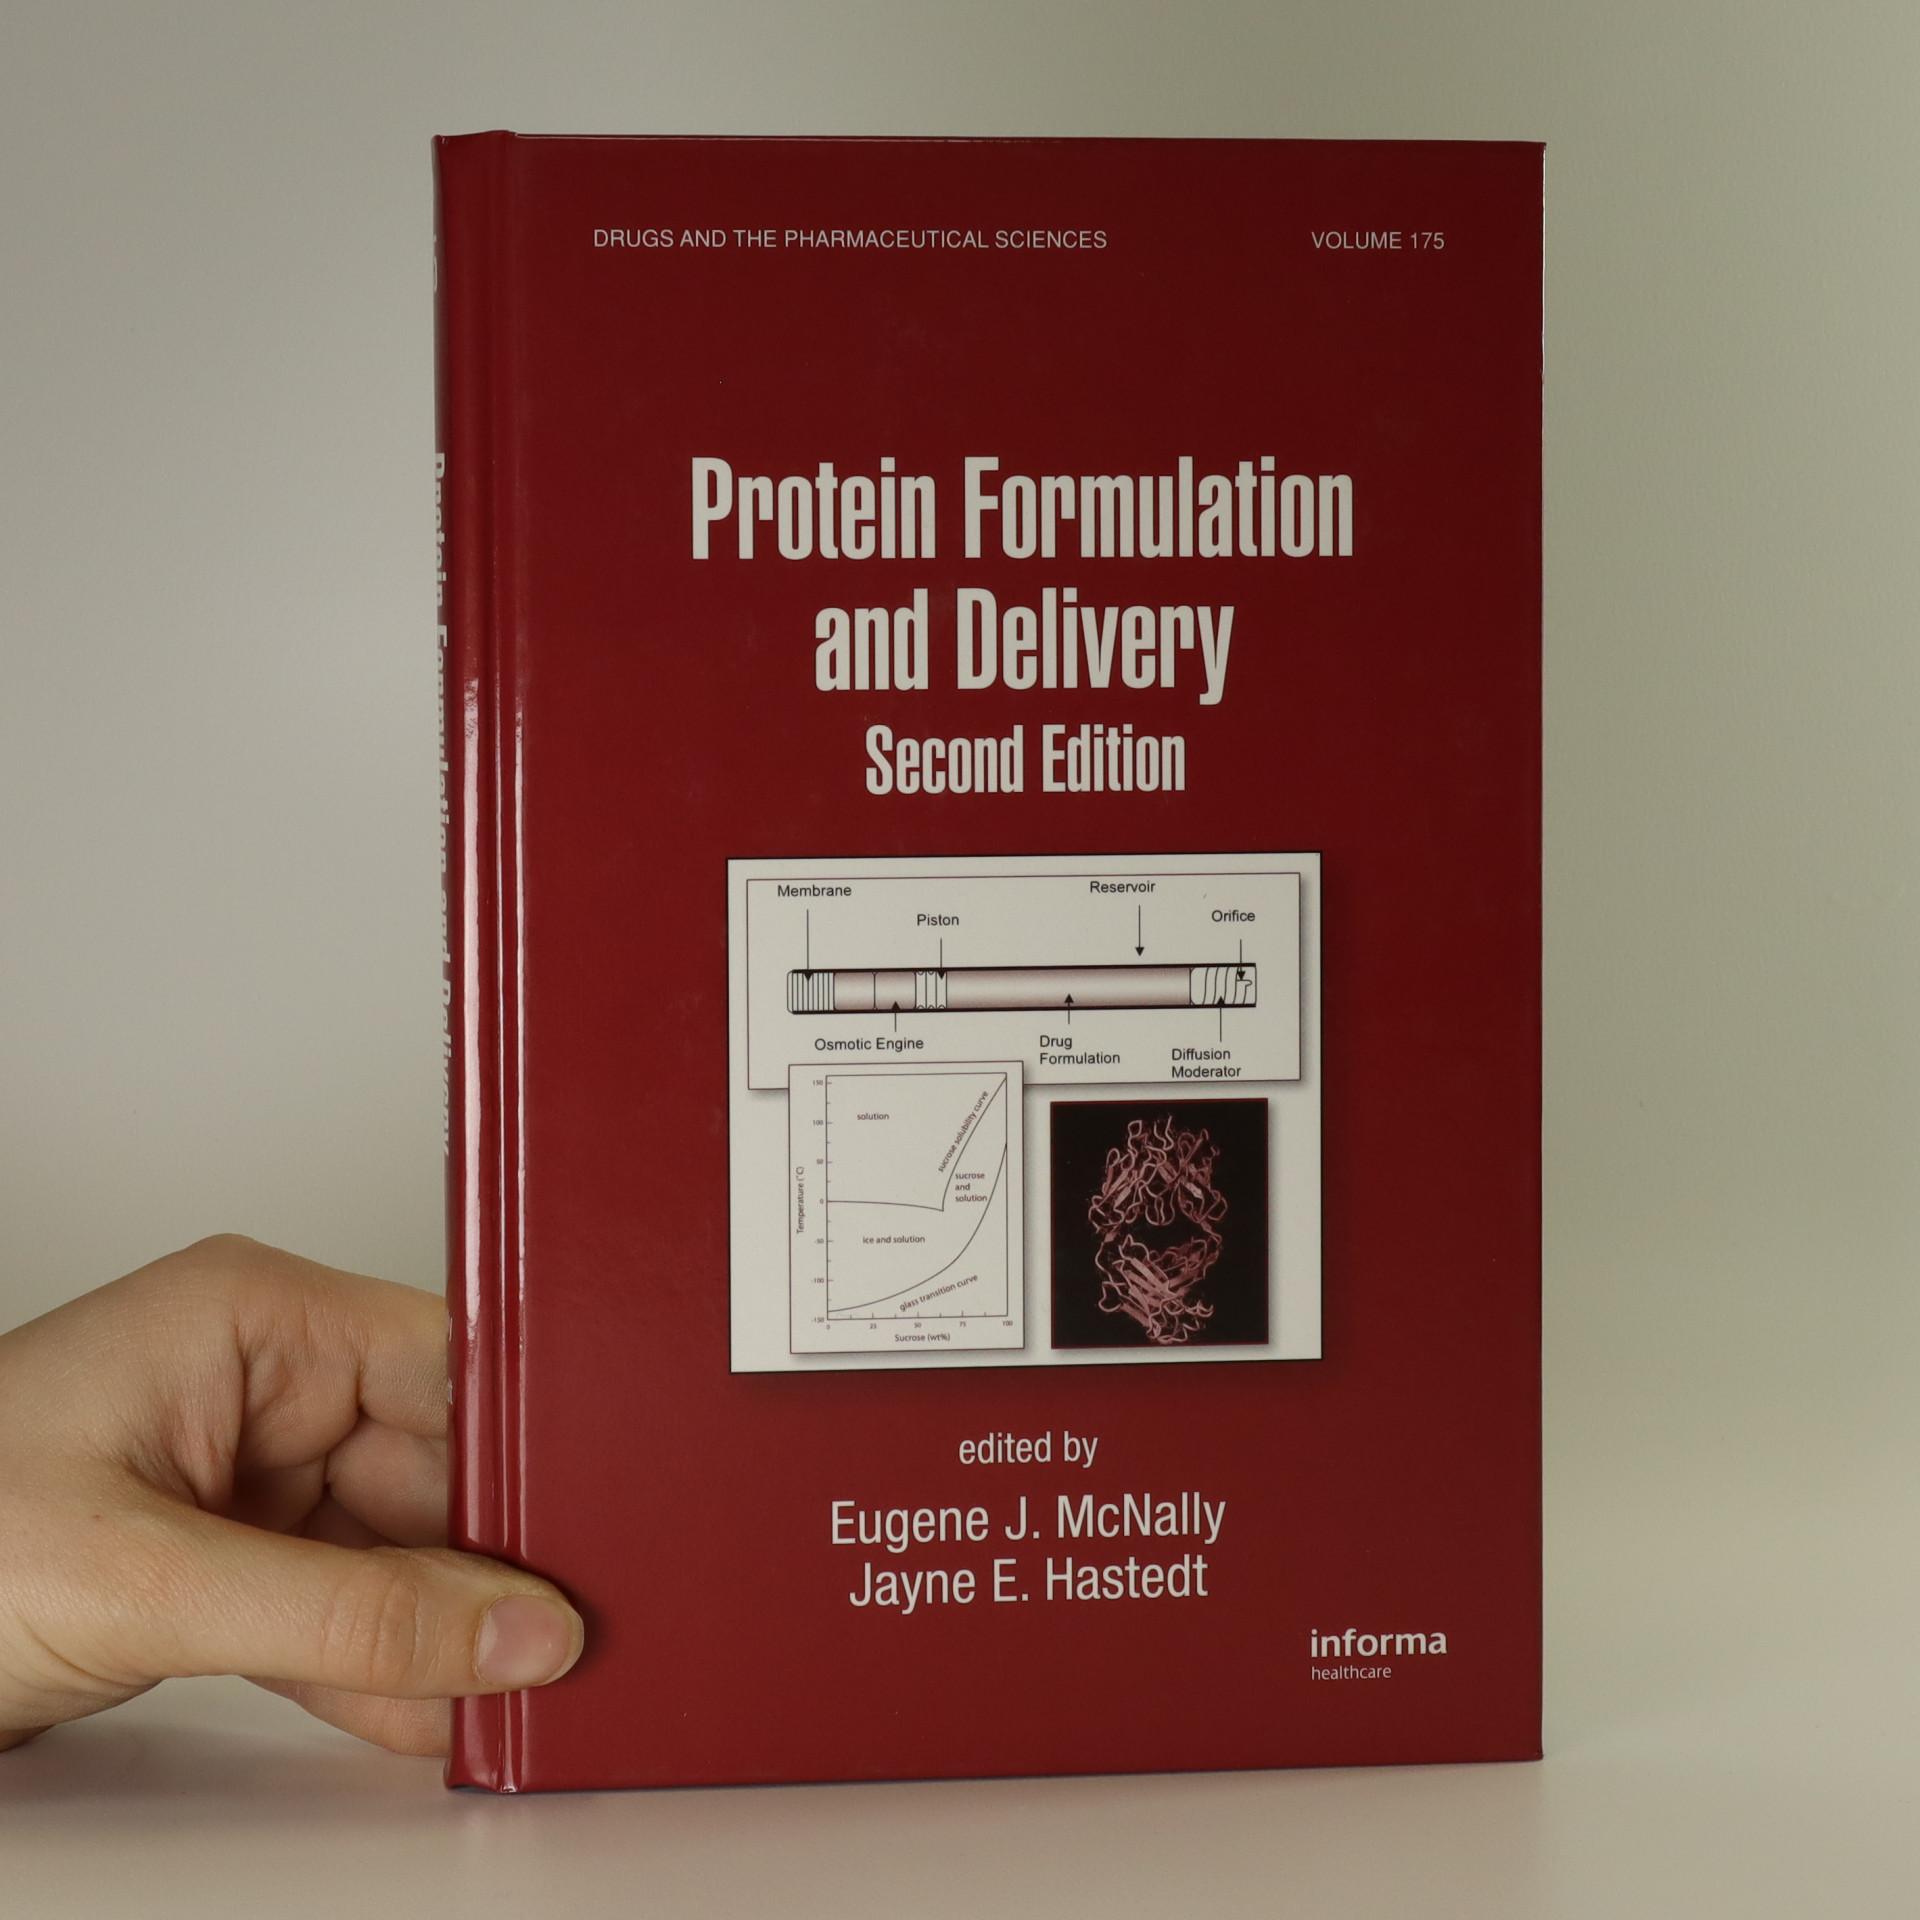 antikvární kniha Protein formulation and delivery, neuveden